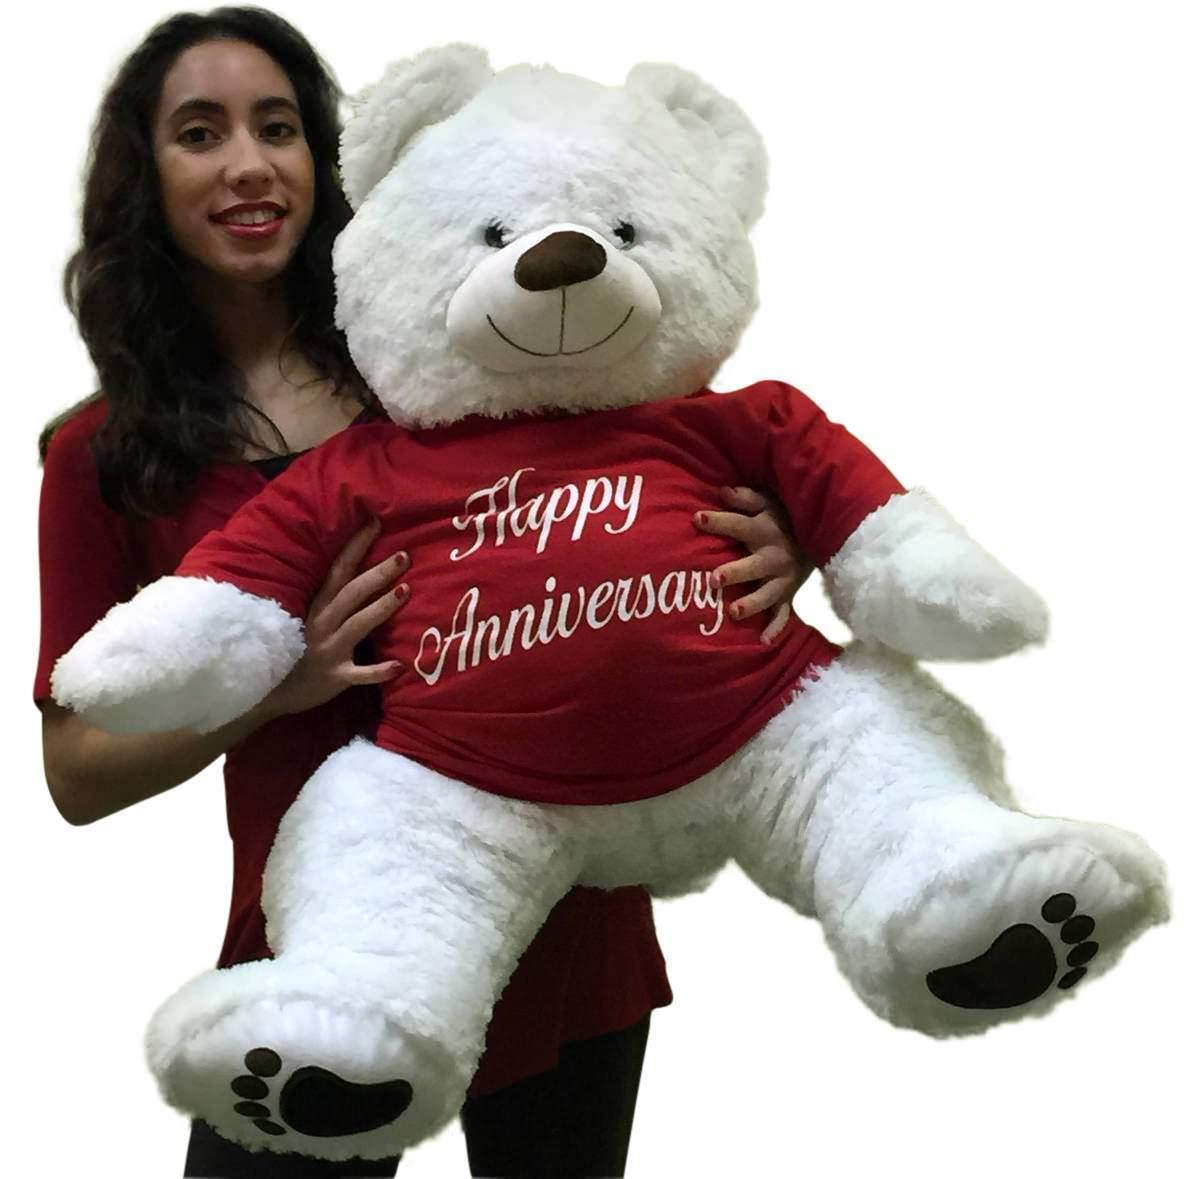 Happy Anniversary Giant Teddy Bear 36 inches Soft Wears HAPPY ANNIVERSARY Tshirt